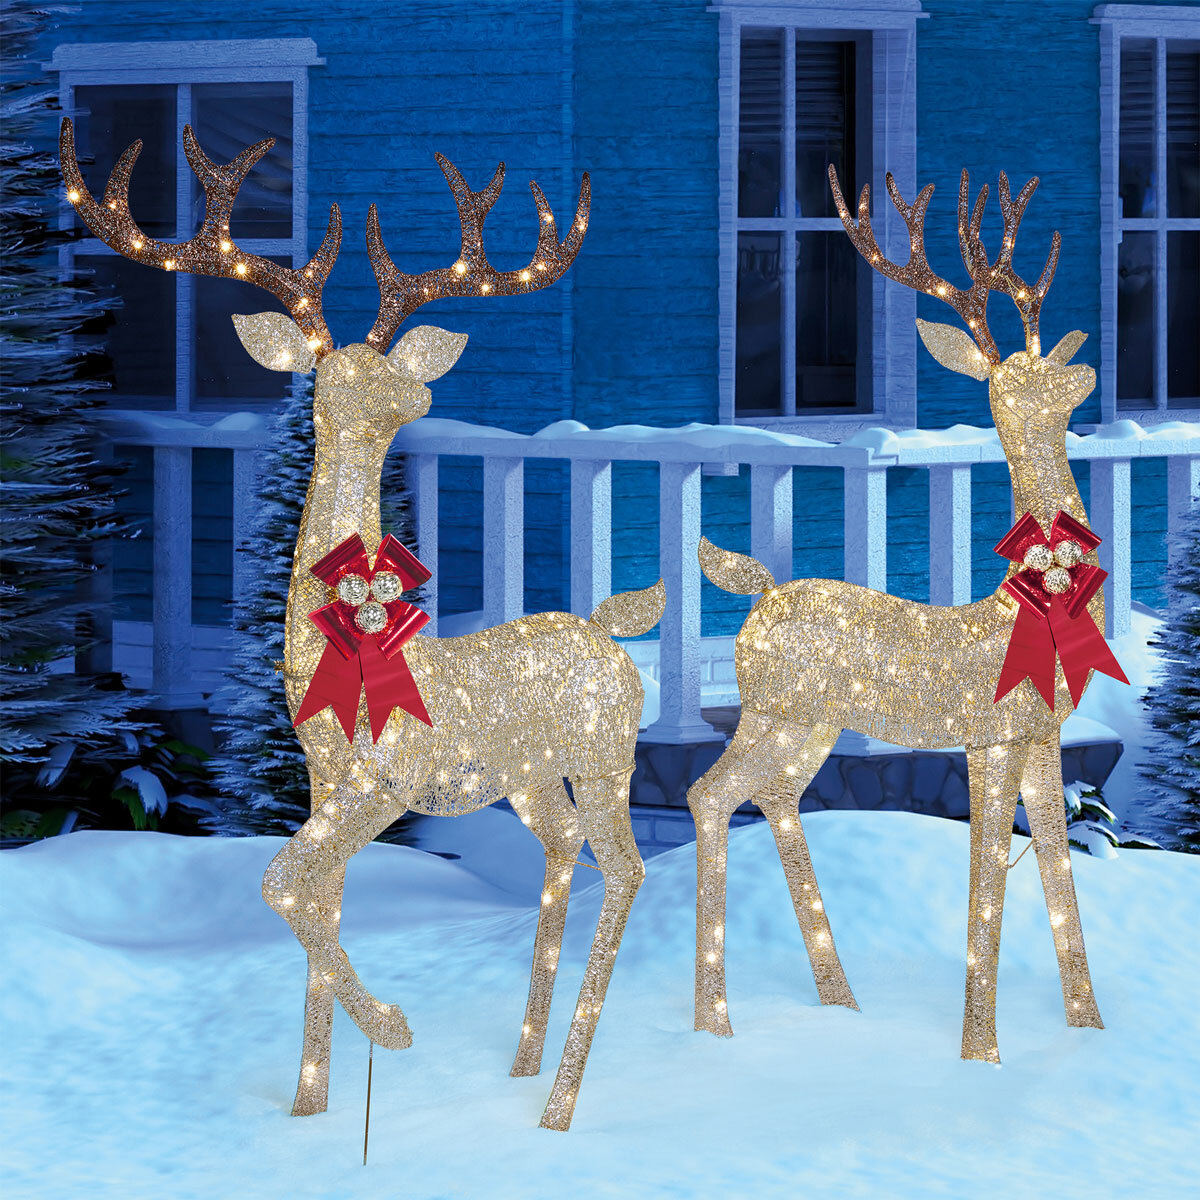 20ft 20 Inches 20.20 cm Indoor/Outdoor Christmas Reindeer Family ...